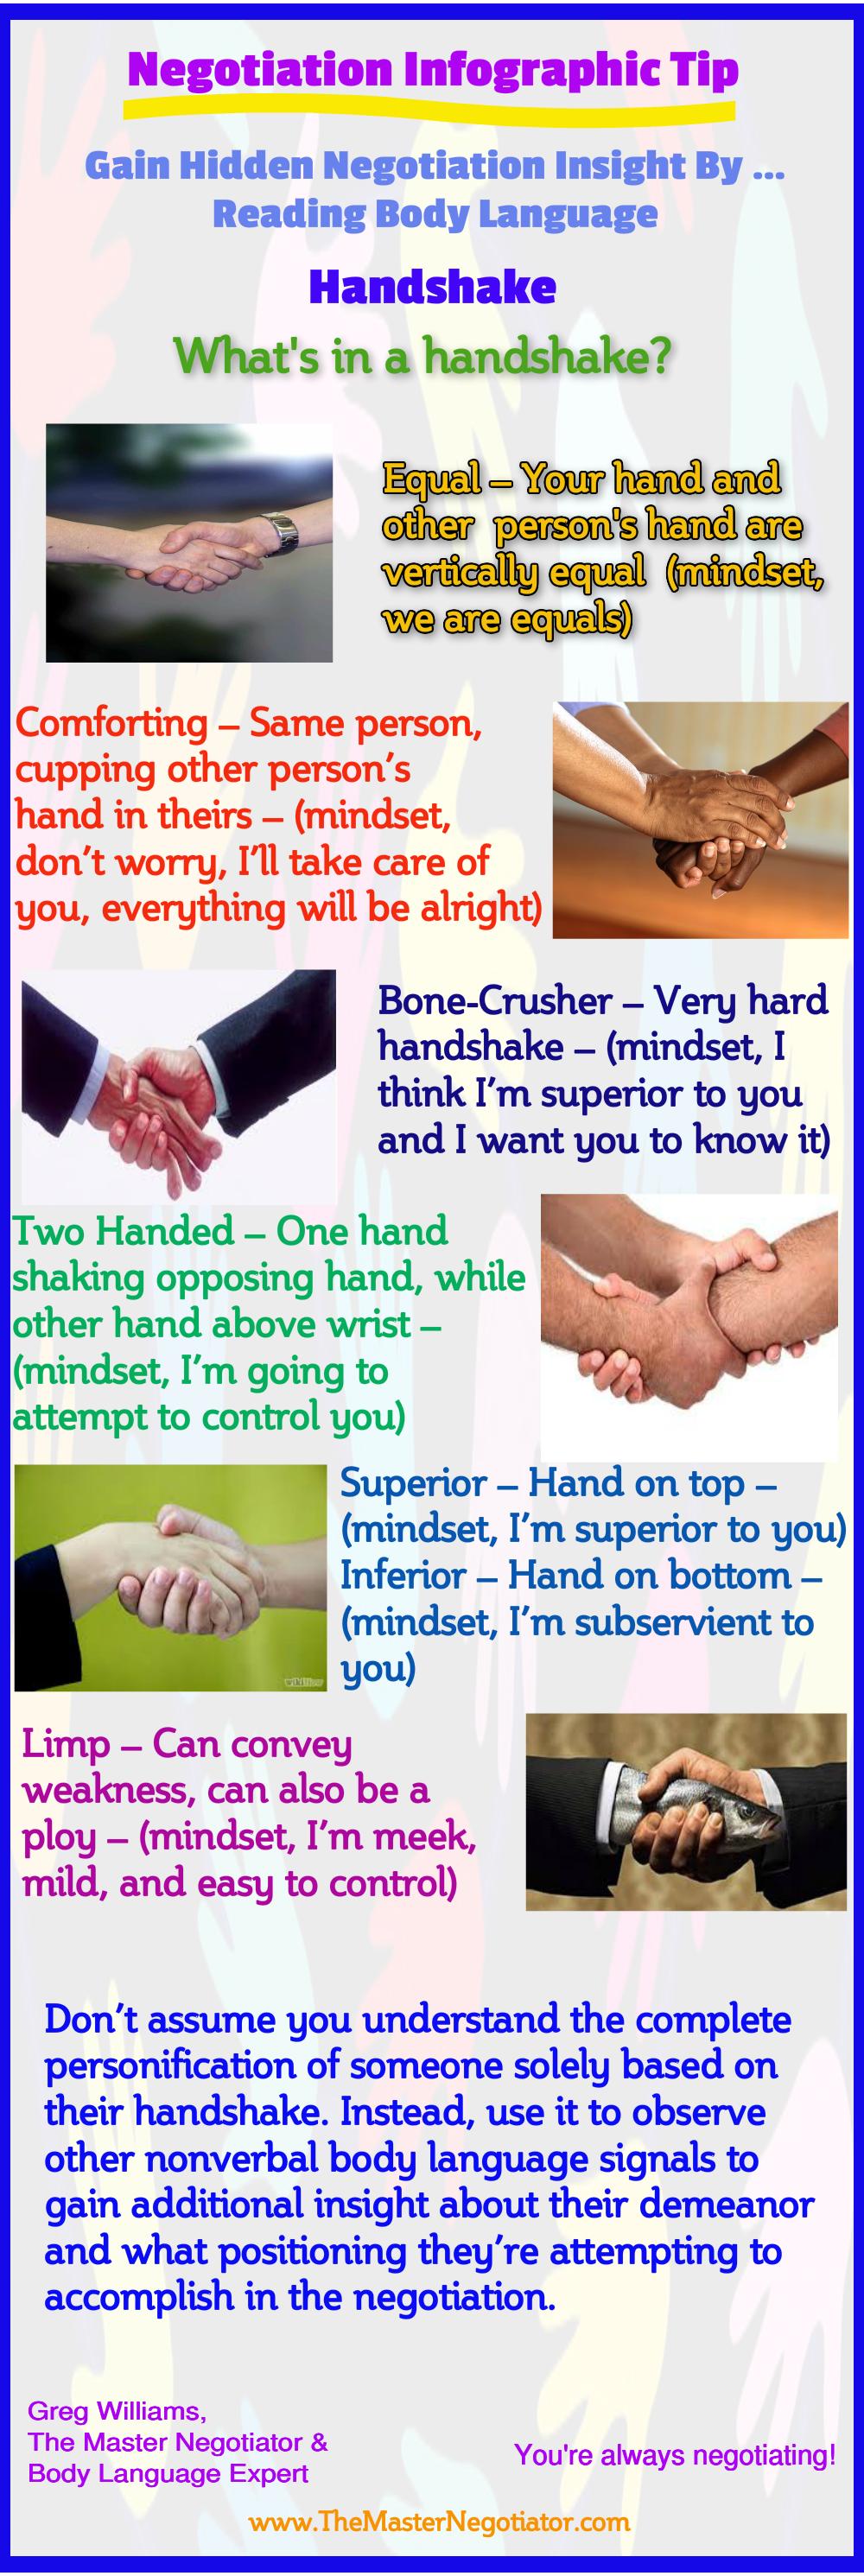 Gain Hidden Negotiation Insight By Reading Body Language  Handshake